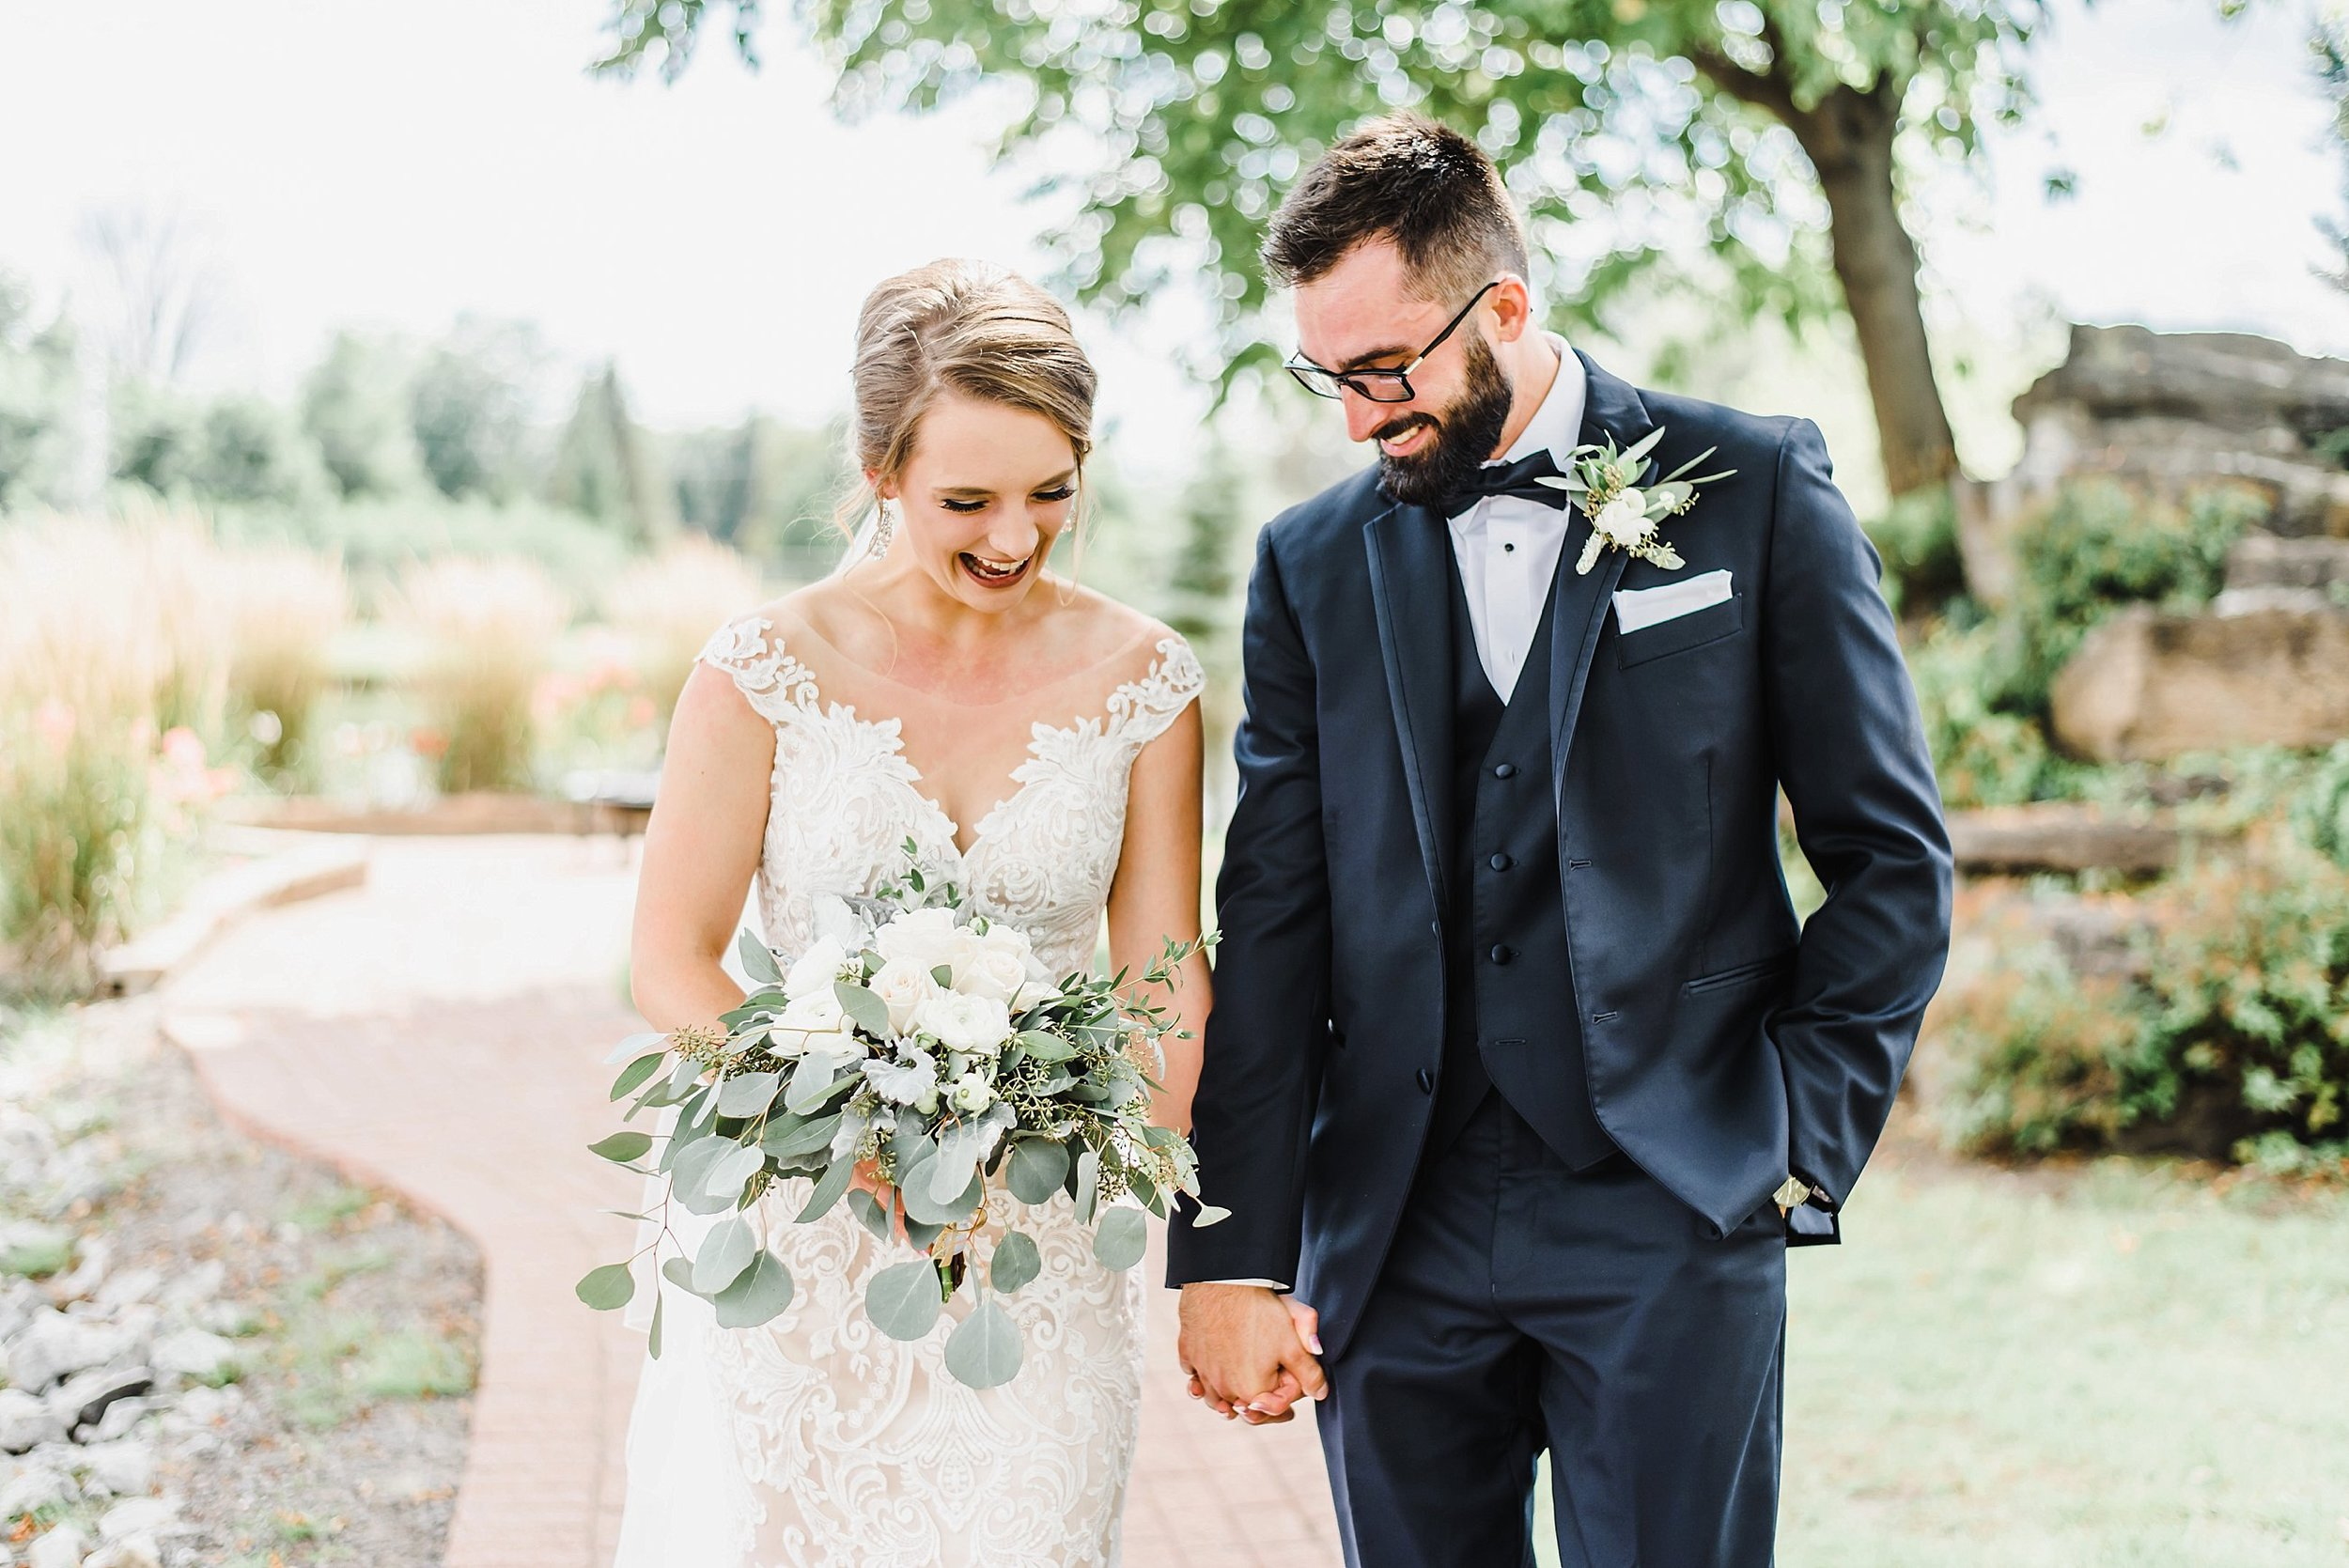 light airy indie fine art ottawa wedding photographer | Ali and Batoul Photography_1253.jpg